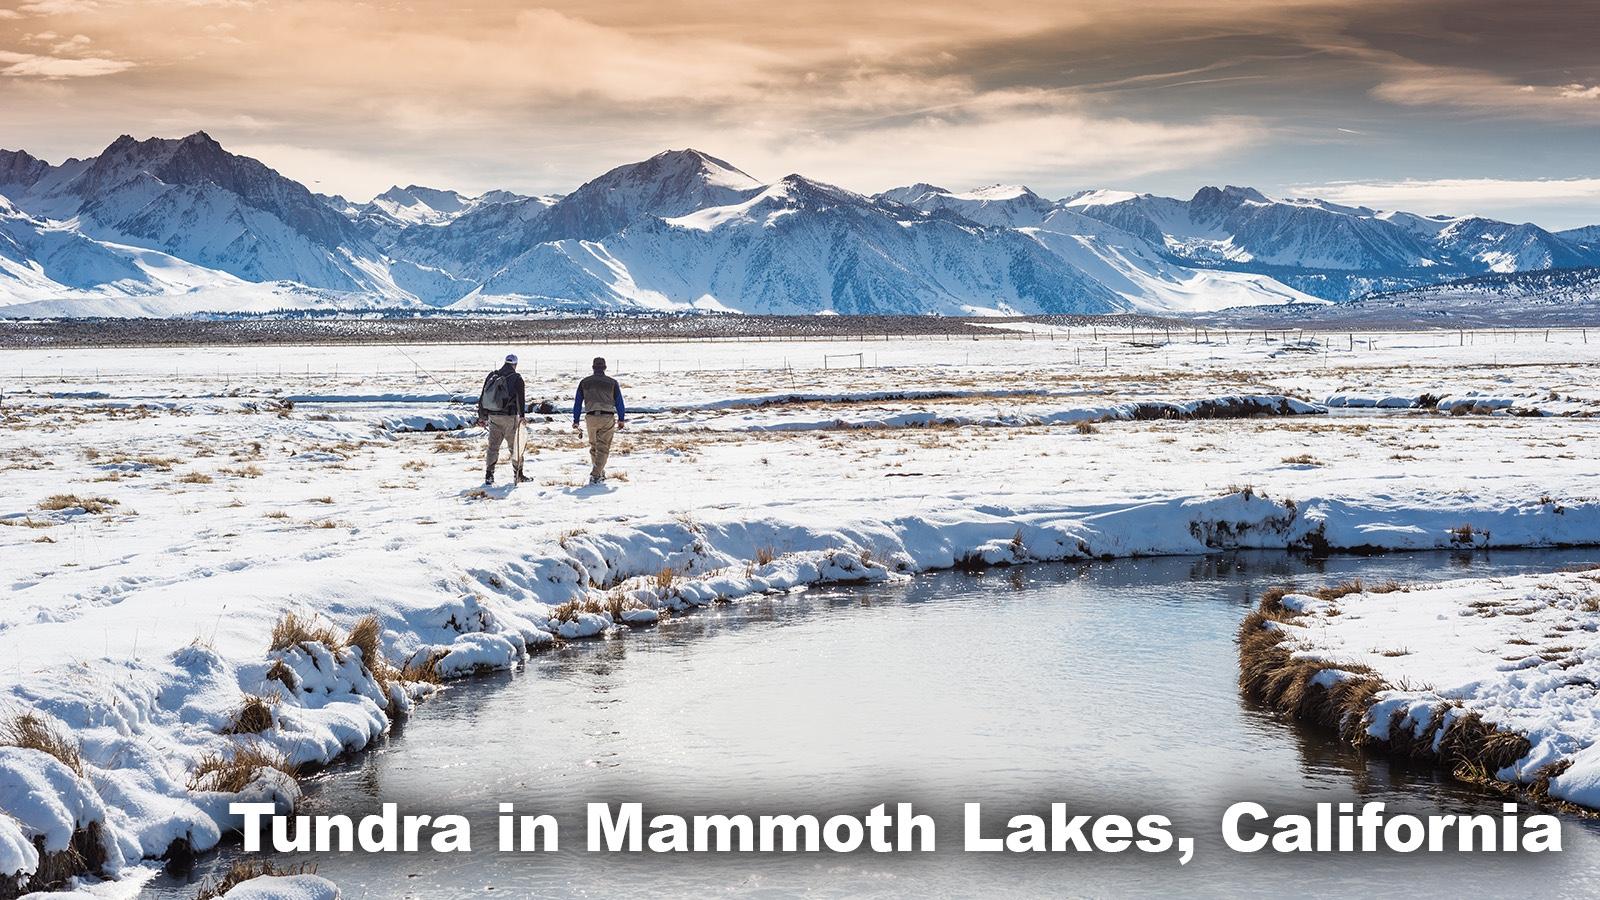 Tundra Biome Mammoth Lakes, California